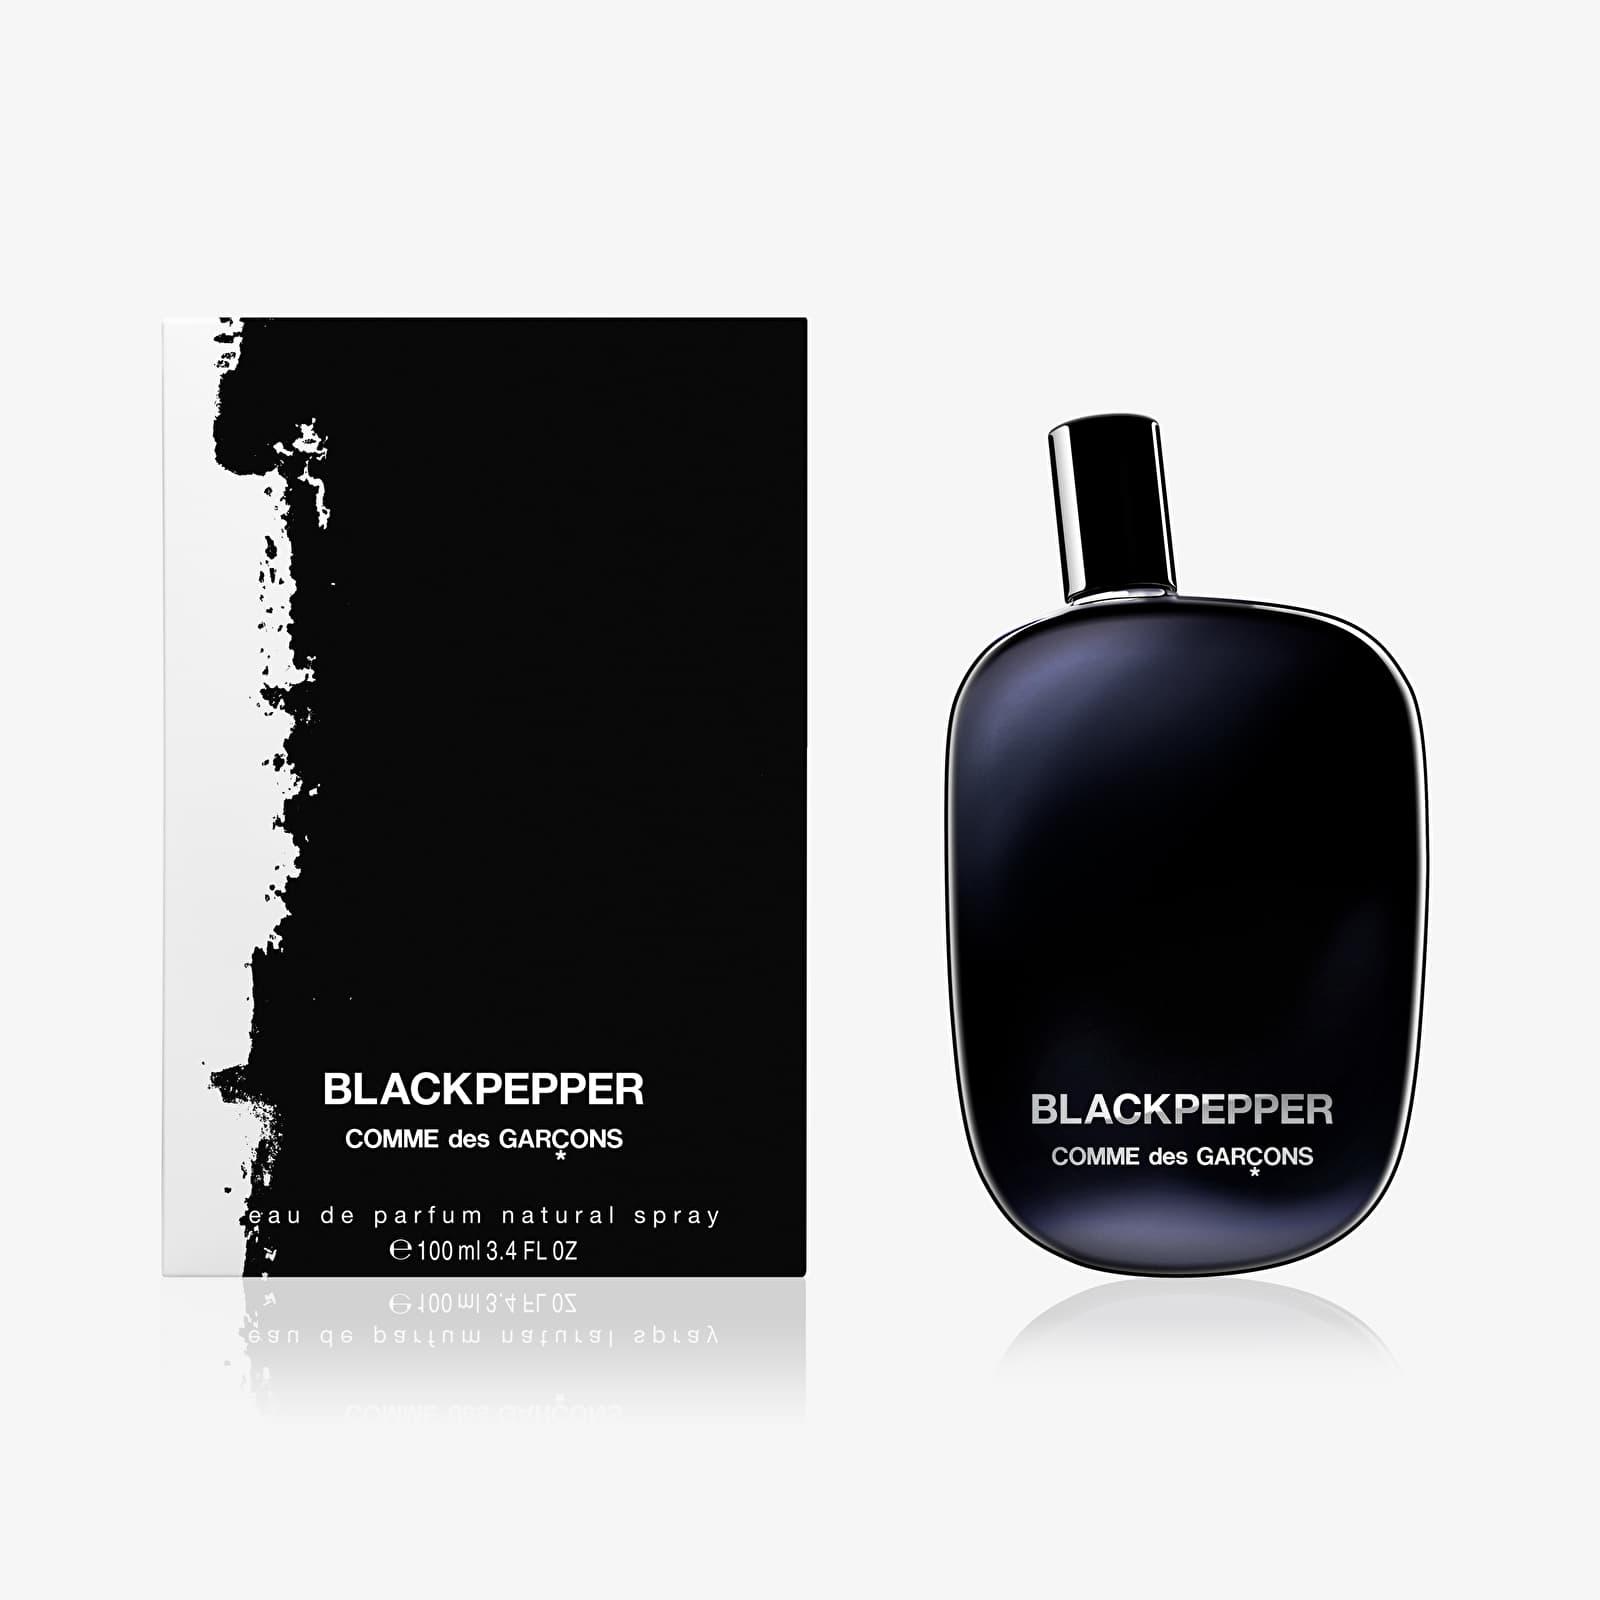 Comme des Garçons Blackpepper Eau De Parfum Natural Spray 100ml